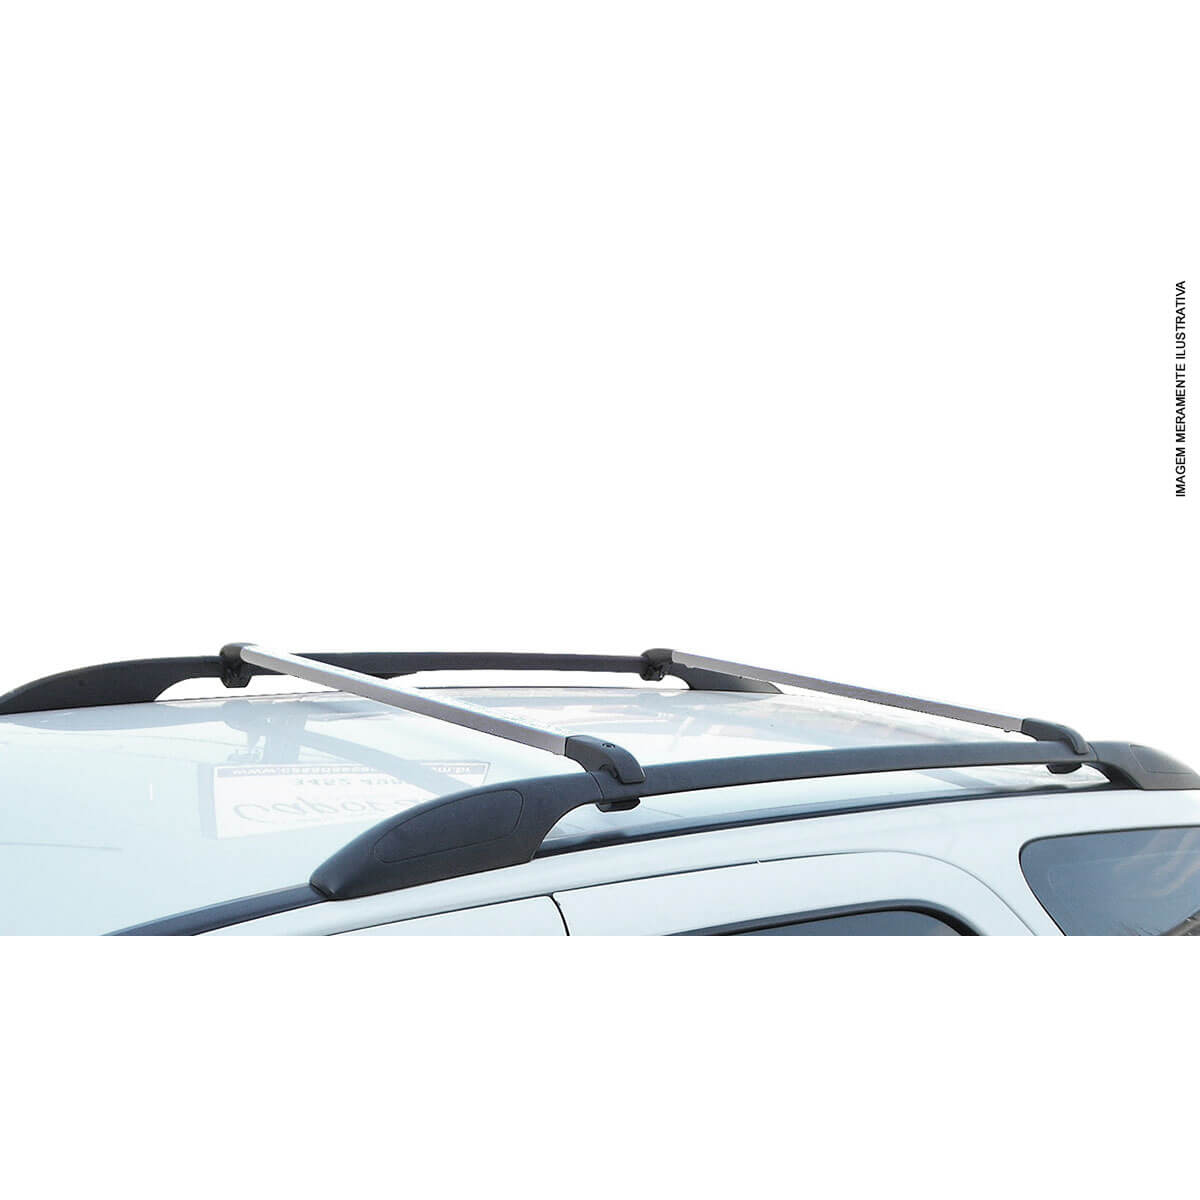 Travessa rack de teto alumínio Fiat Mobi Way 2017 a 2021